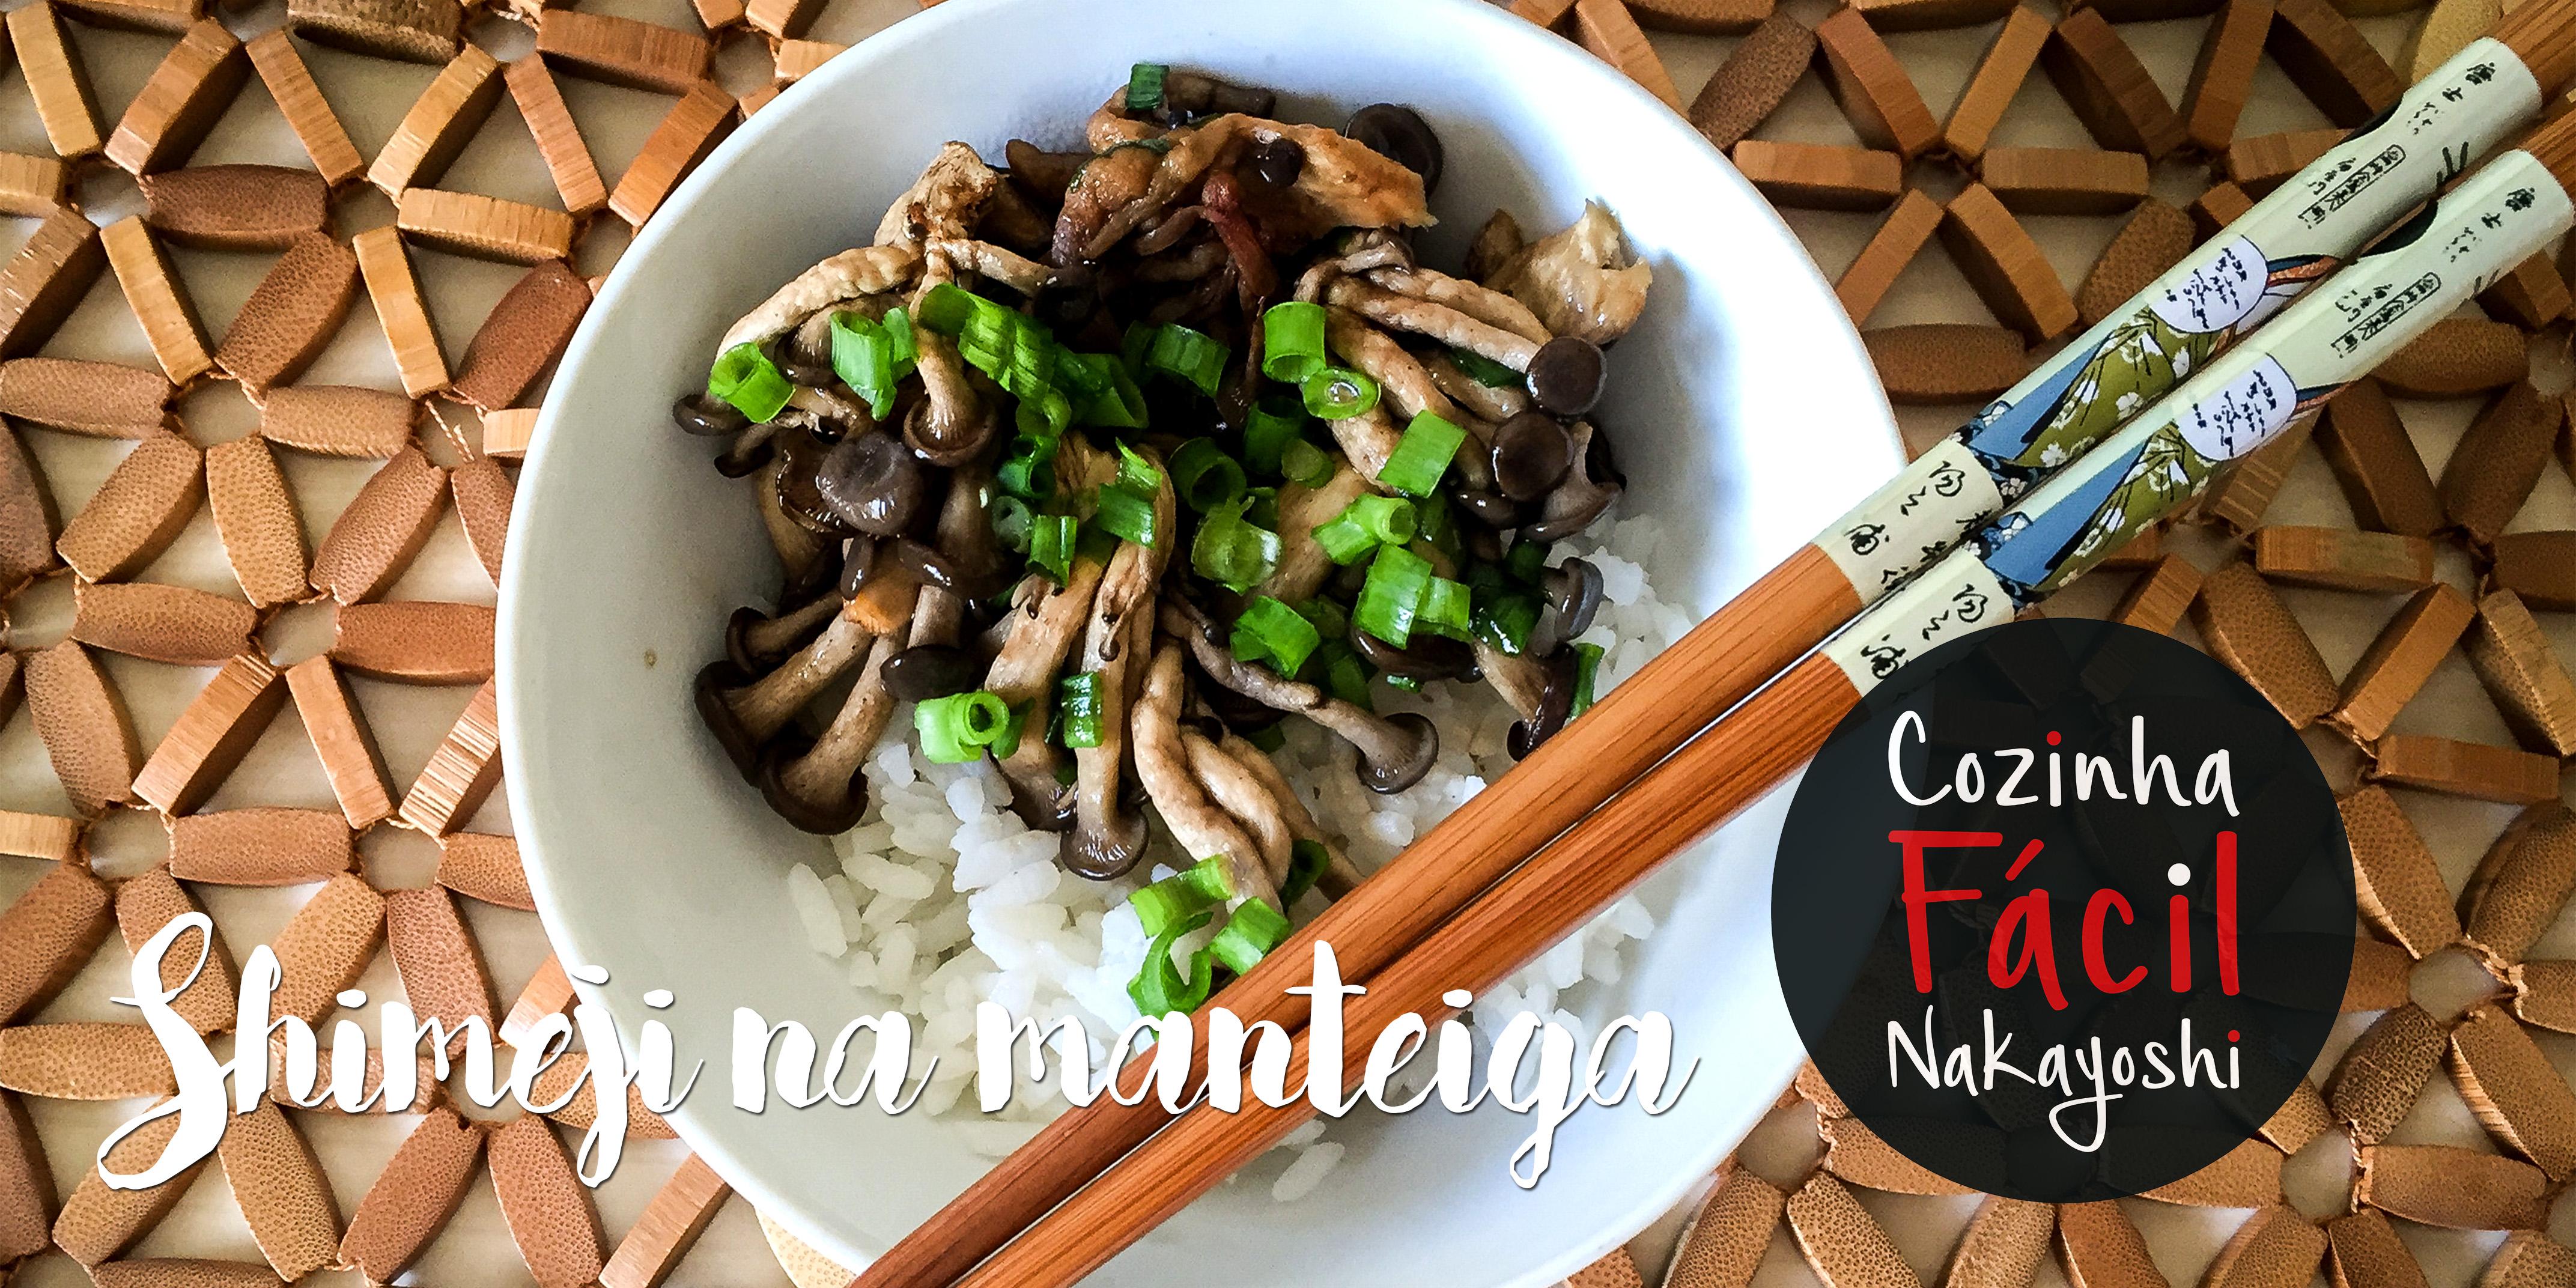 Shimeji na Manteiga | Cozinha Fácil Nakayoshi #1